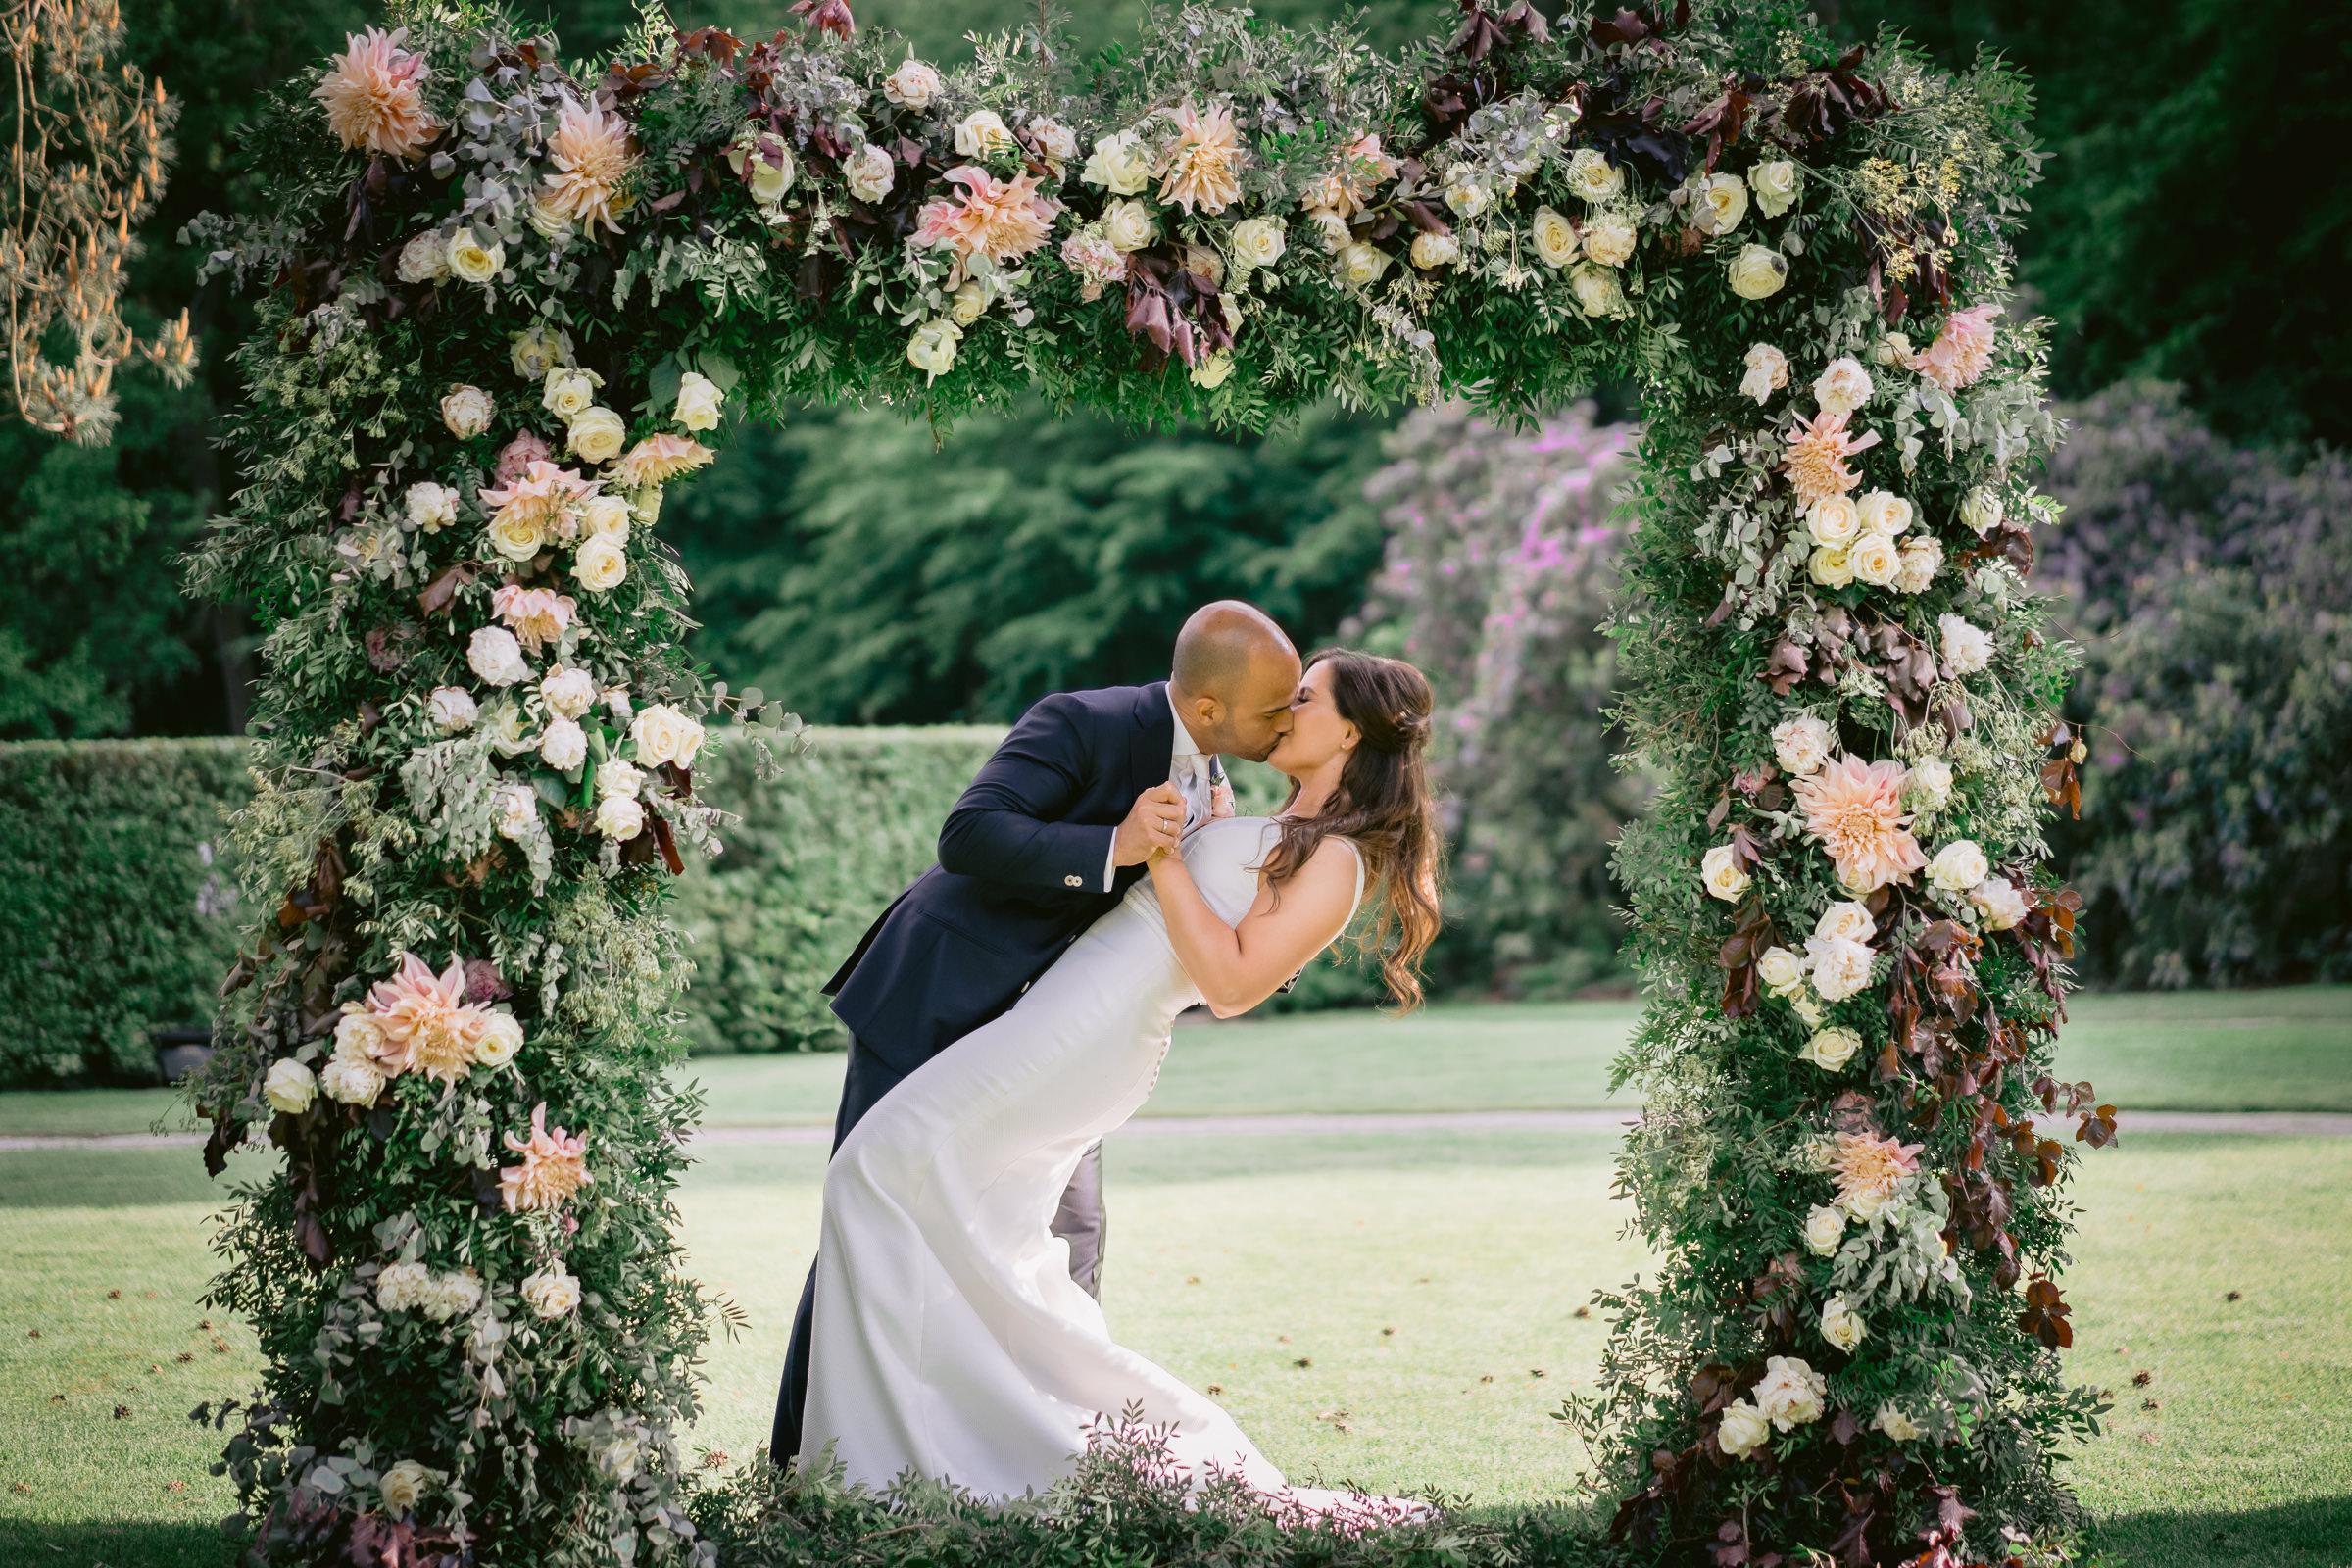 portrait-of-groom-kissing-bride-under-floral-arbor-peter-van-der-lingen-wedding-photography